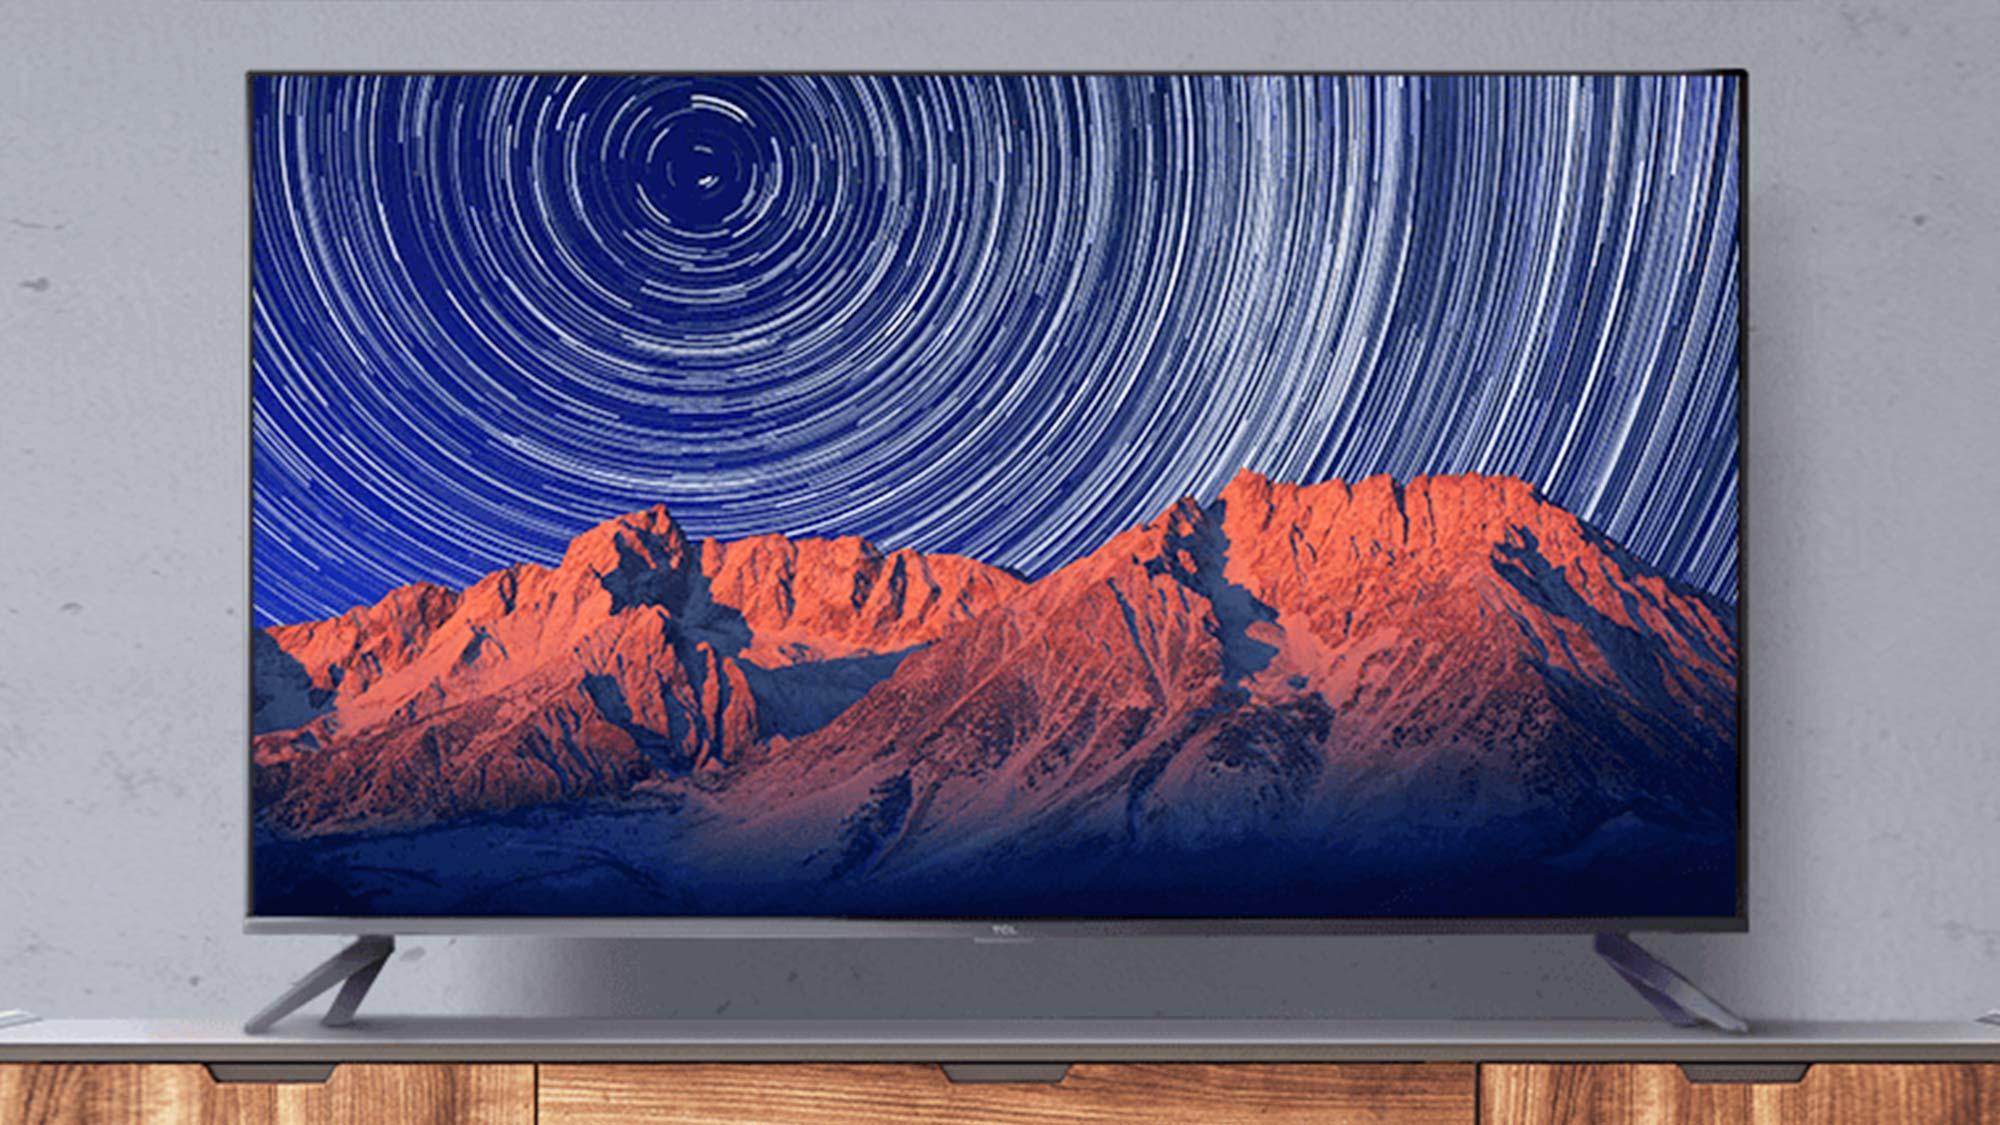 TCL 5-Series Roku TV (S535) review